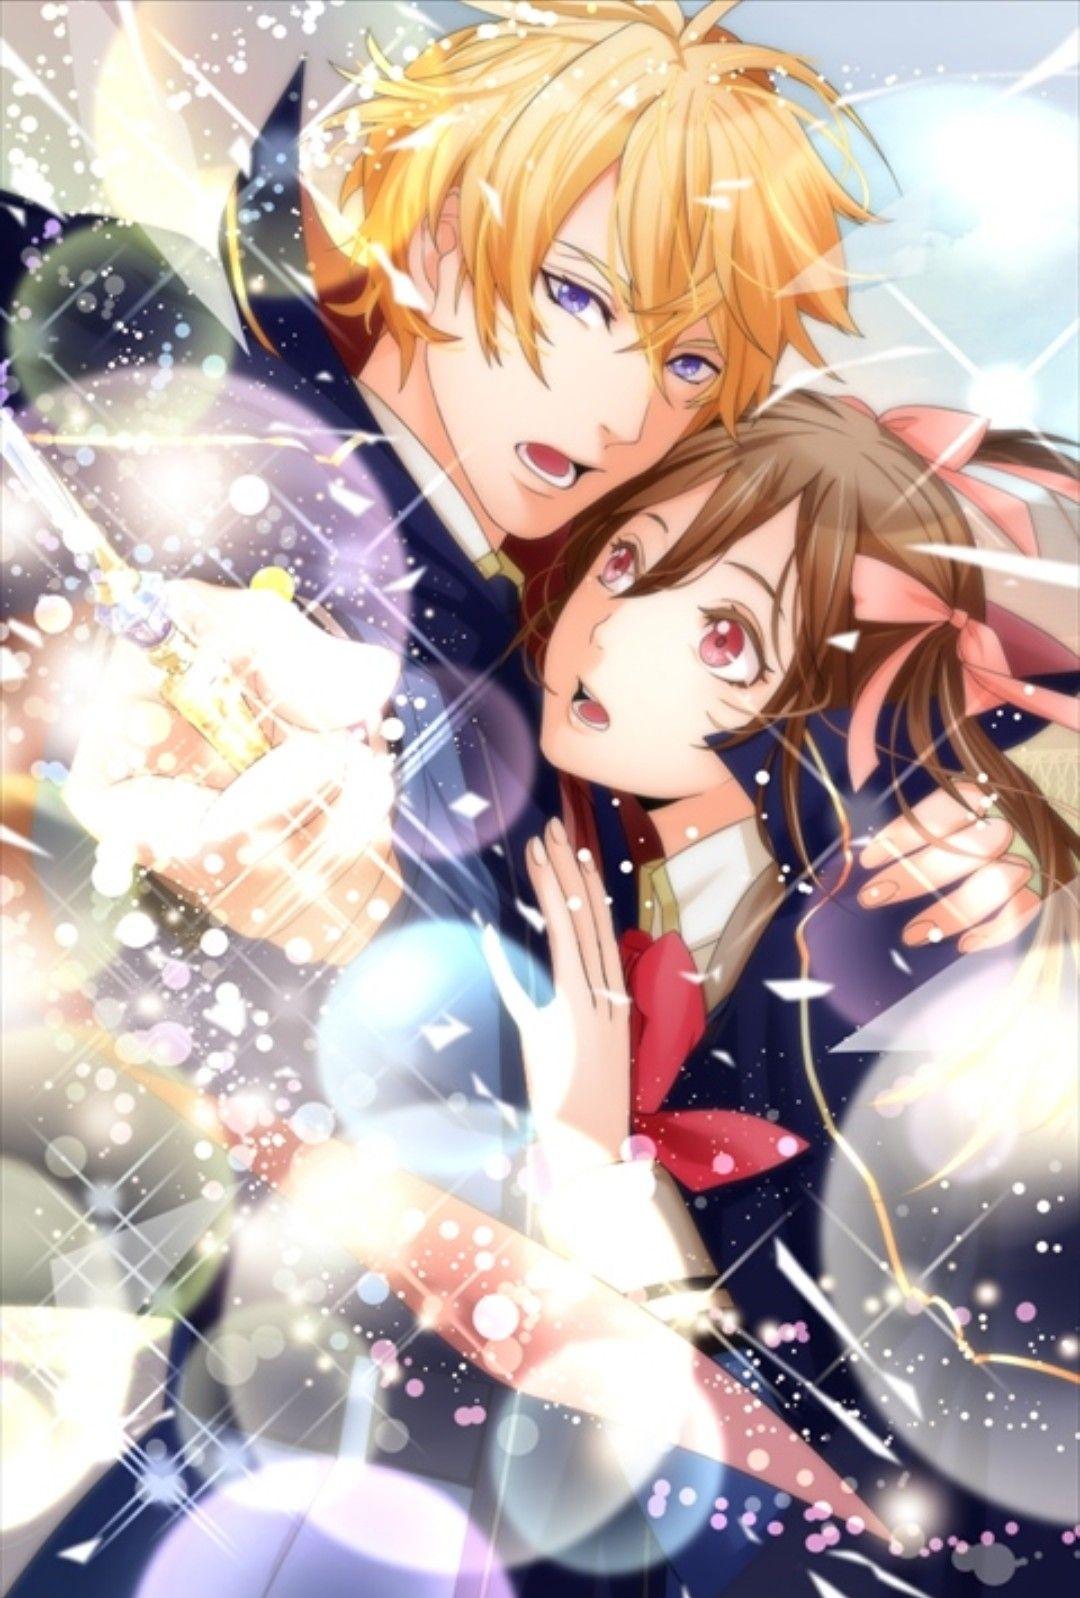 Elias Goldstein Elias Anime De Romance Anime